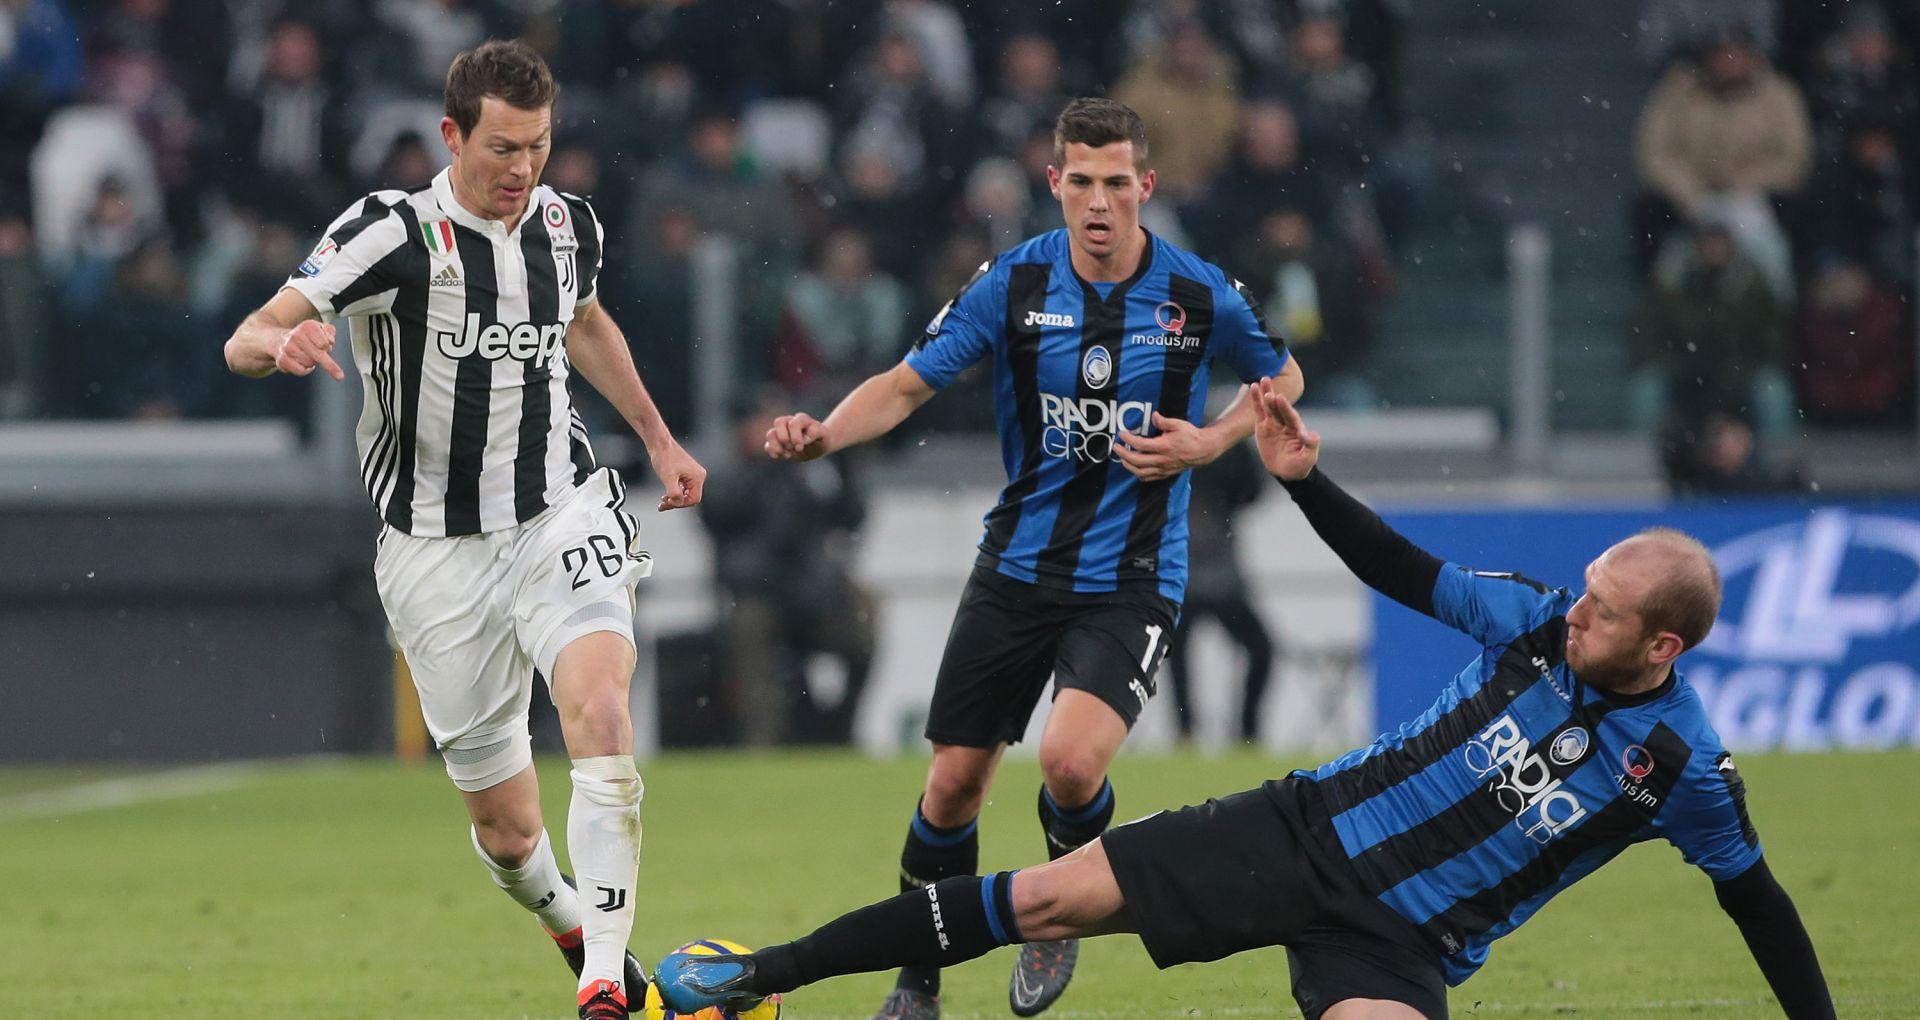 Stephan Lichtsteiner Andrea Masiello Juventus Atalanta Coppa Italia